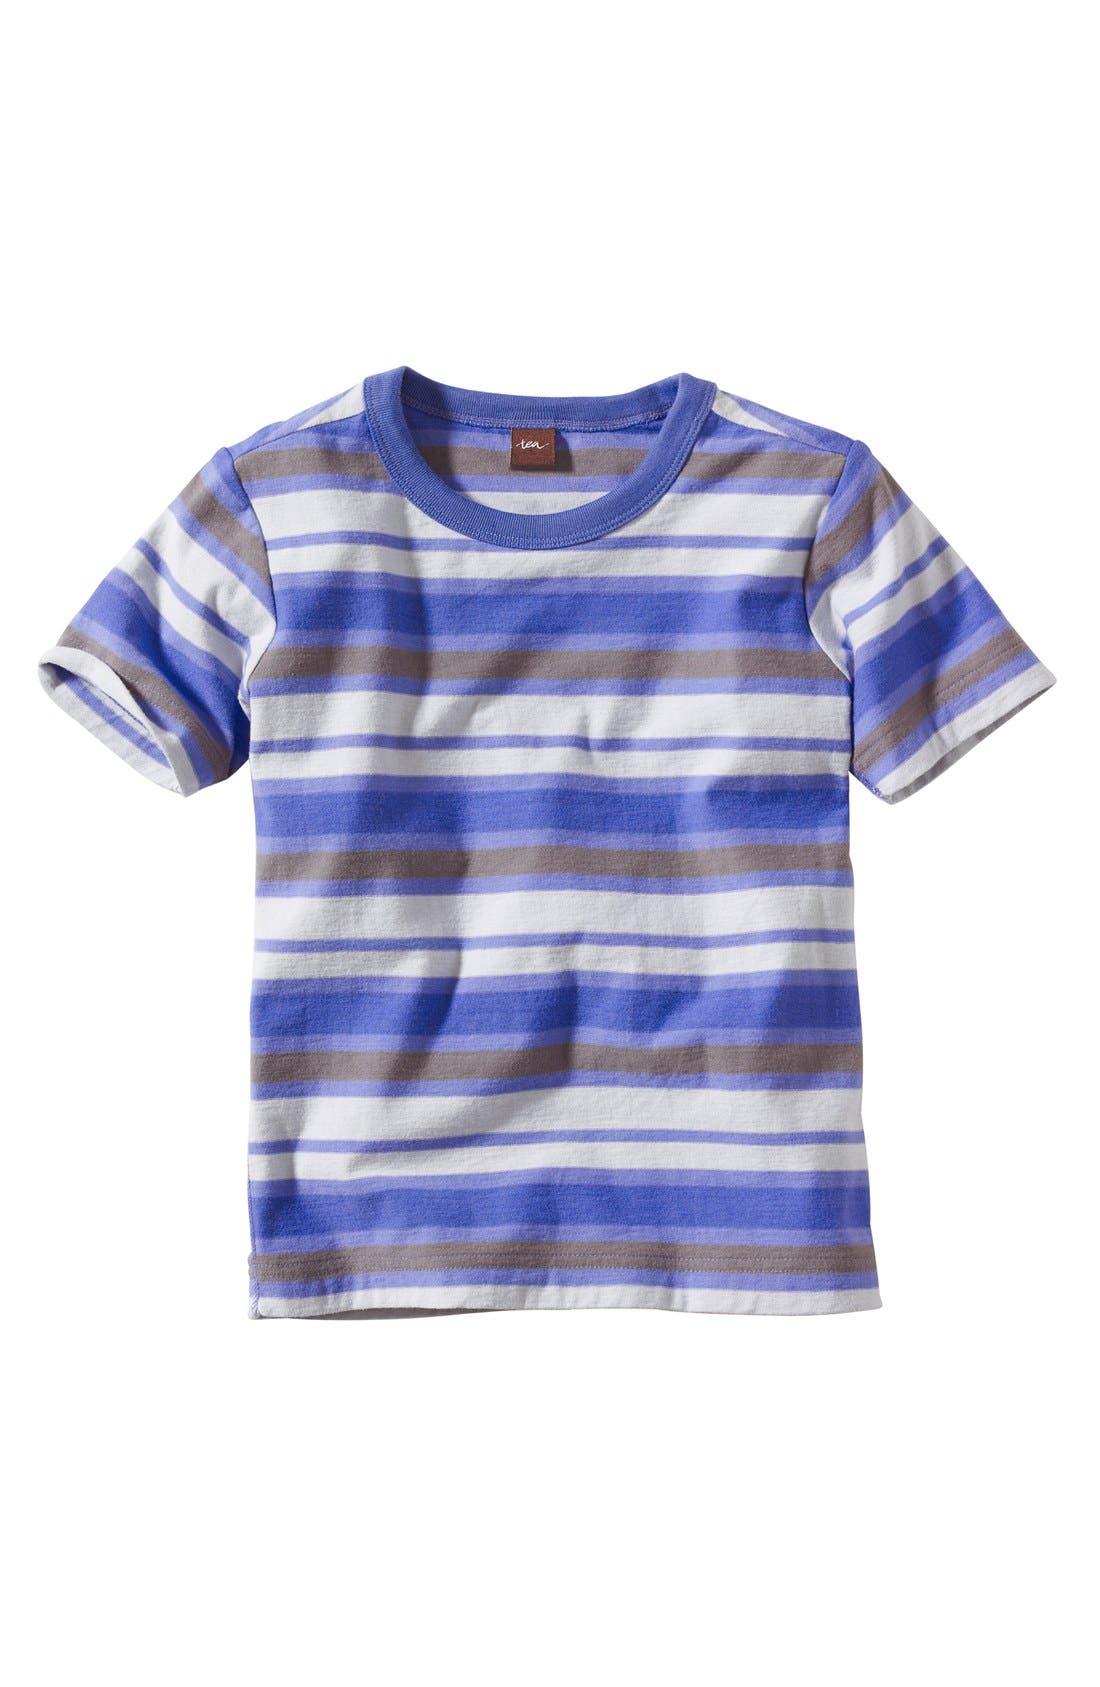 Alternate Image 1 Selected - Tea Collection 'Majorelle' Stripe T-Shirt (Little Boys & Big Boys)